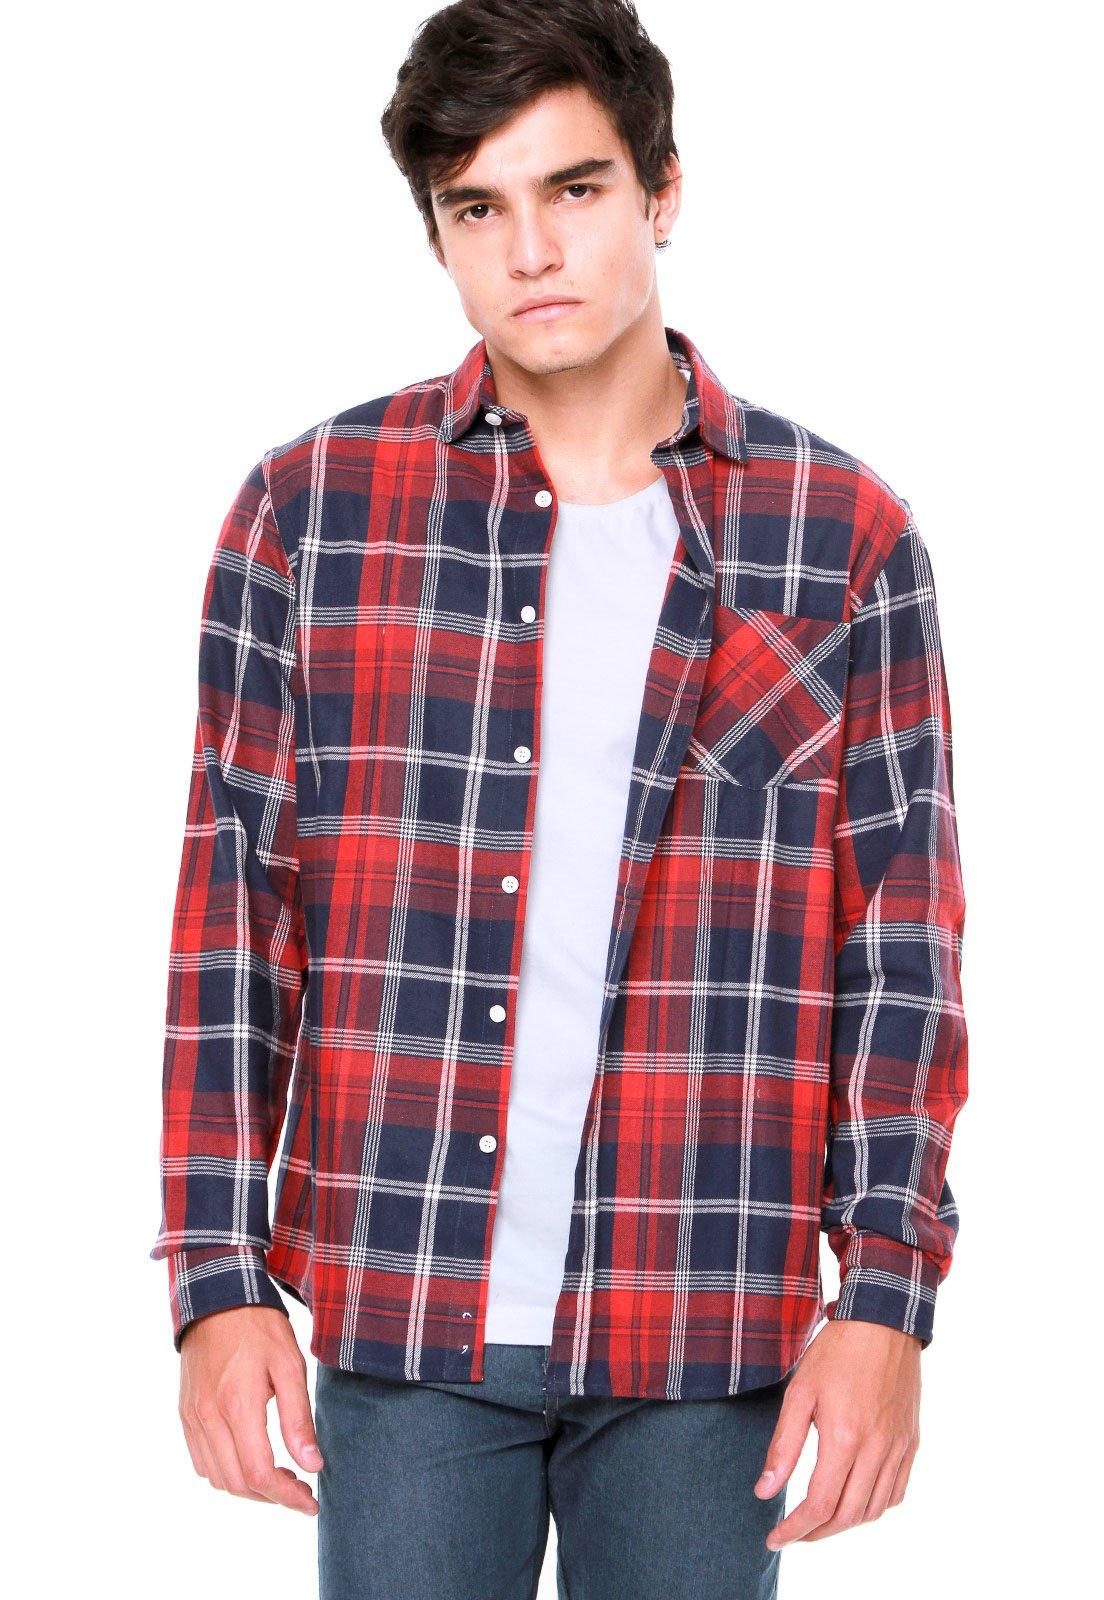 8ab2137340 Mr Kitsch. Camisa Mr Kitsch Xadrez Vermelha Azul